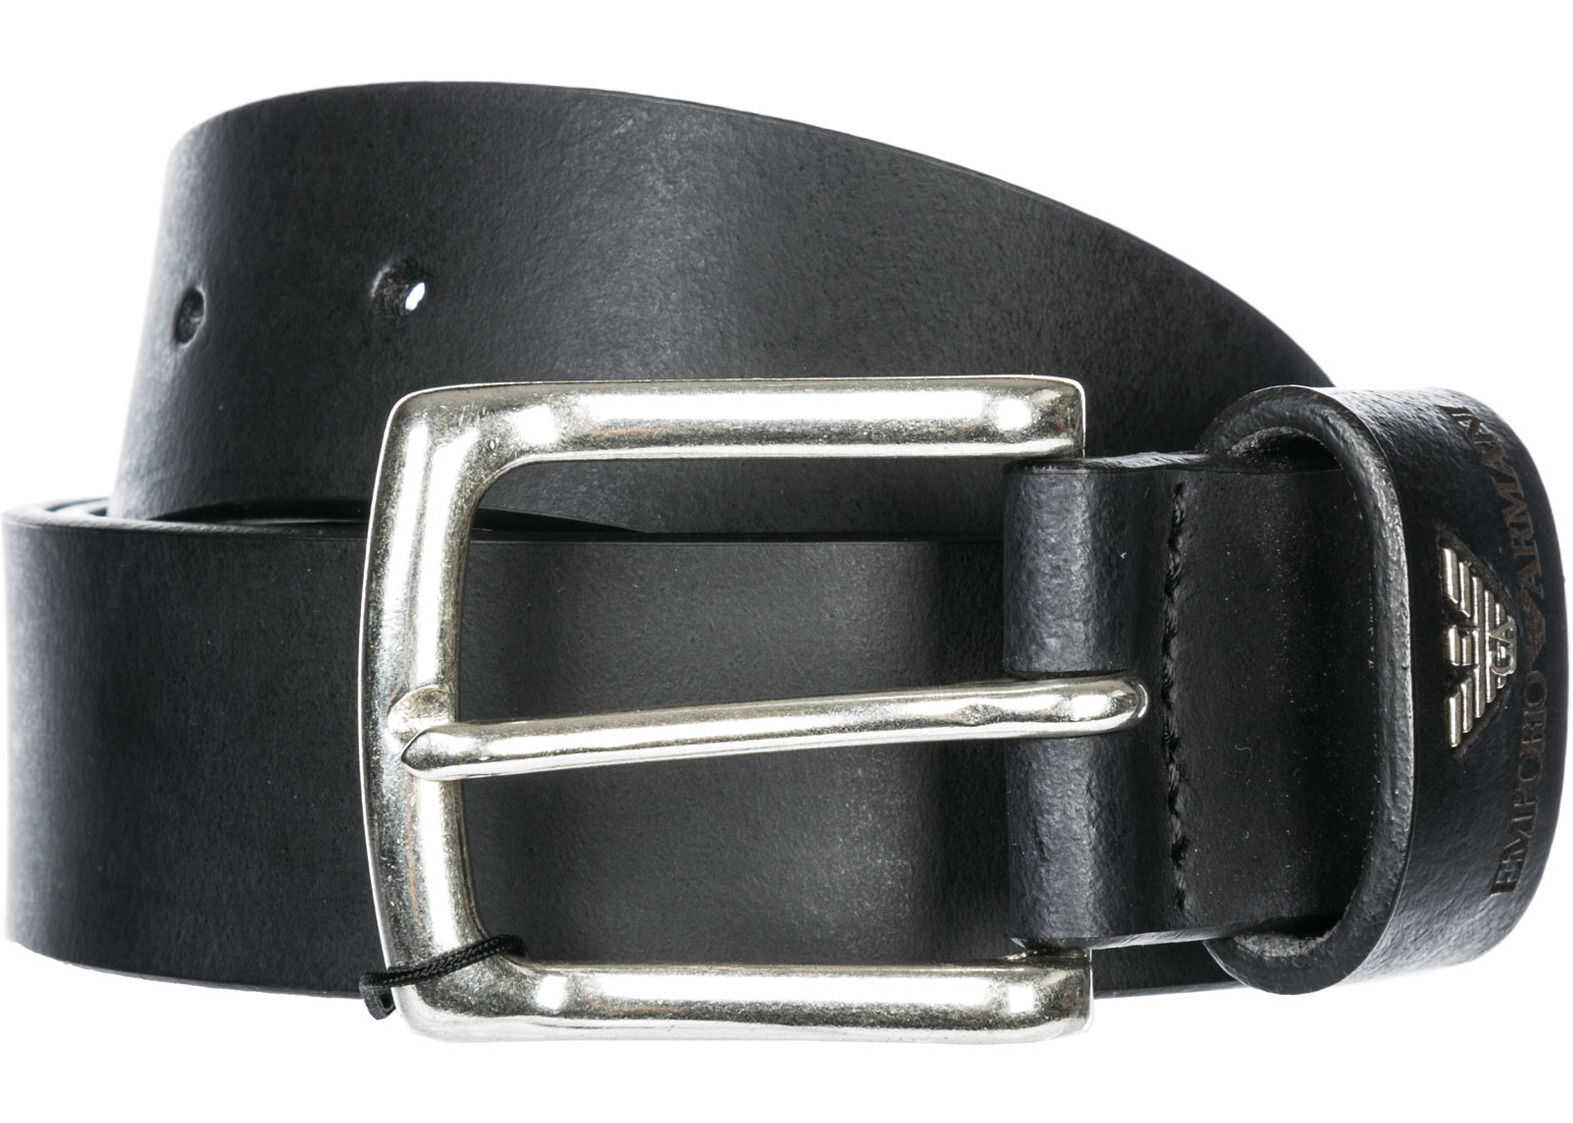 Emporio Armani Leather Belt Black